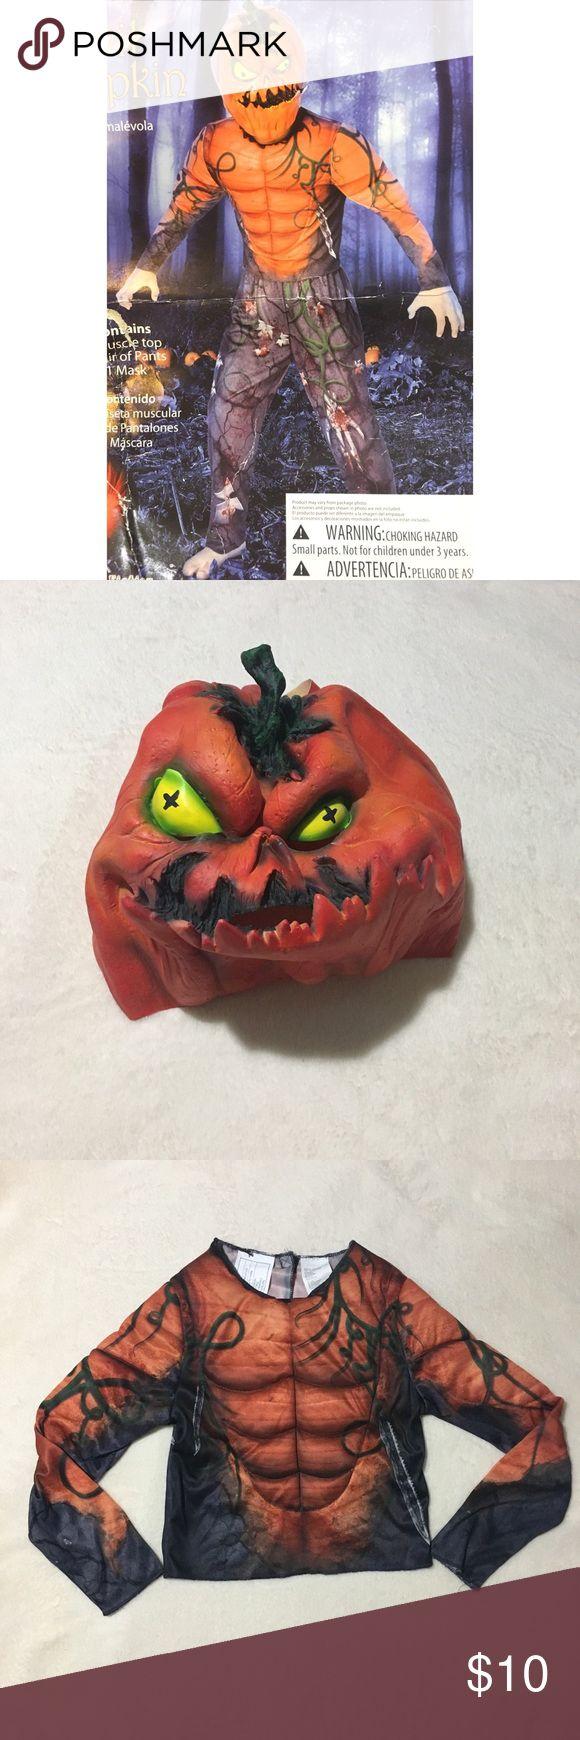 Evil pumpkin costume for kids evil pumpkin definitely an award winner costume comes